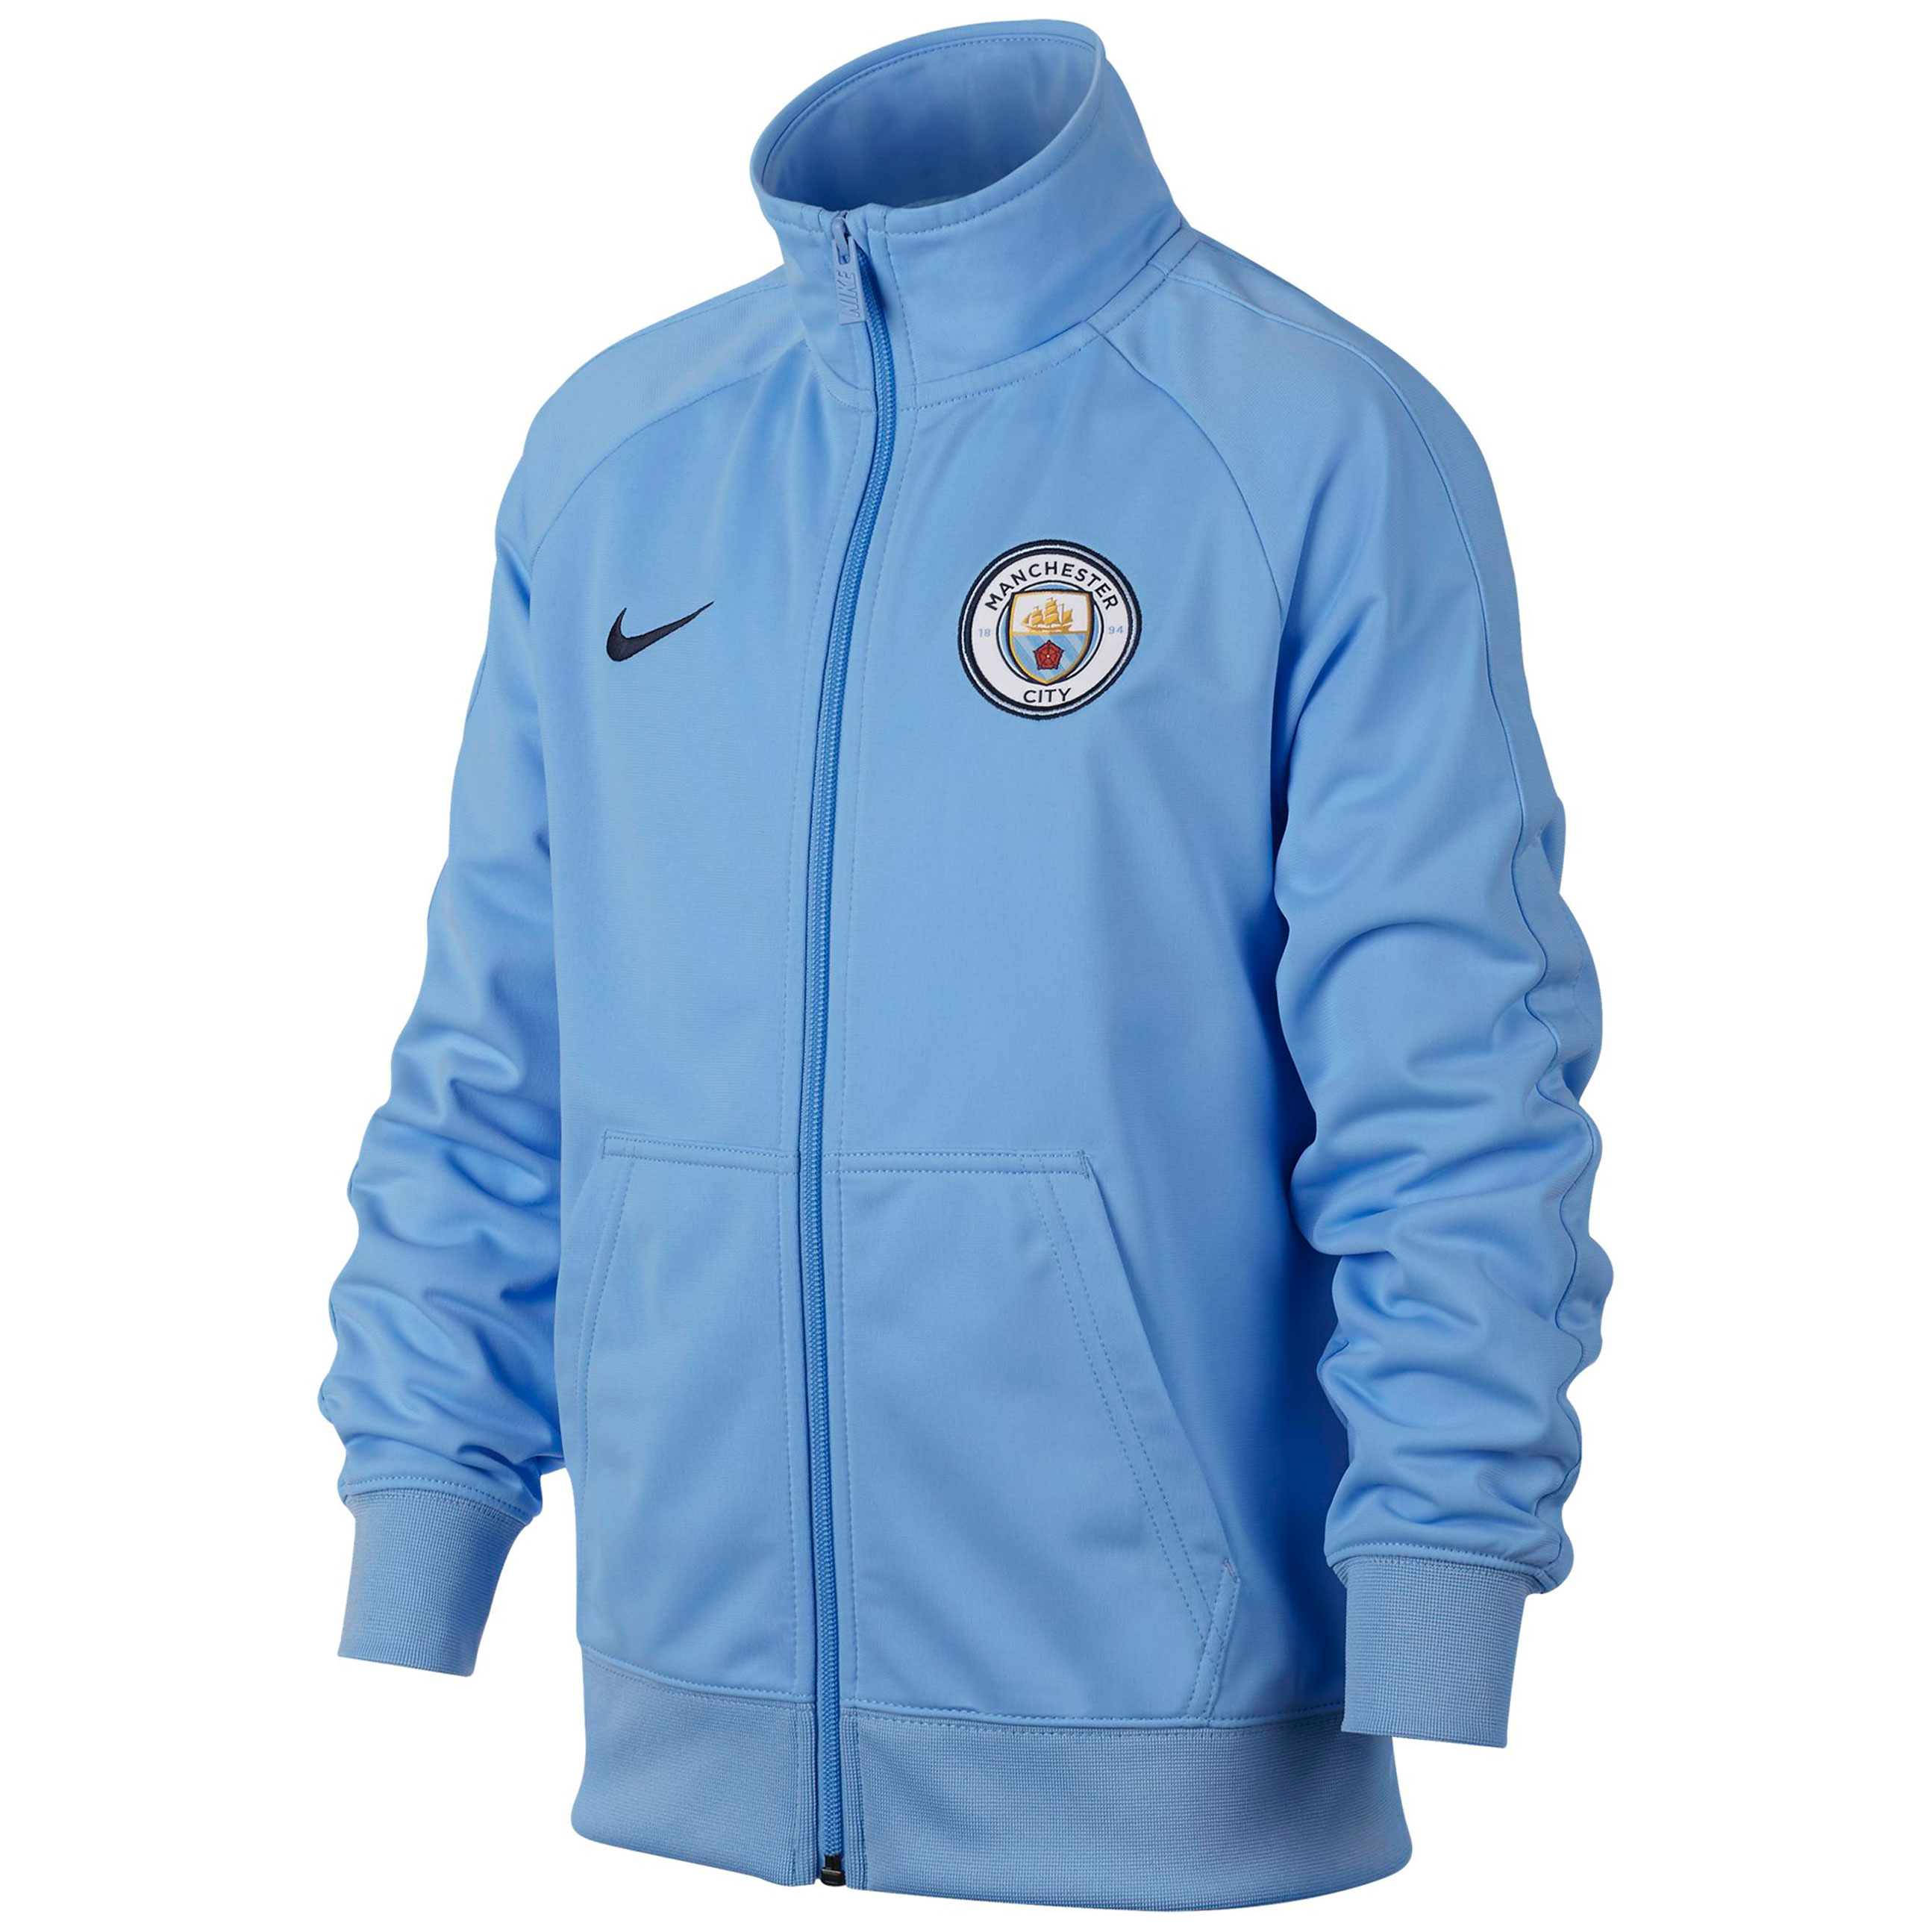 Manchester City Core Track Jacket - Light Blue - Kids